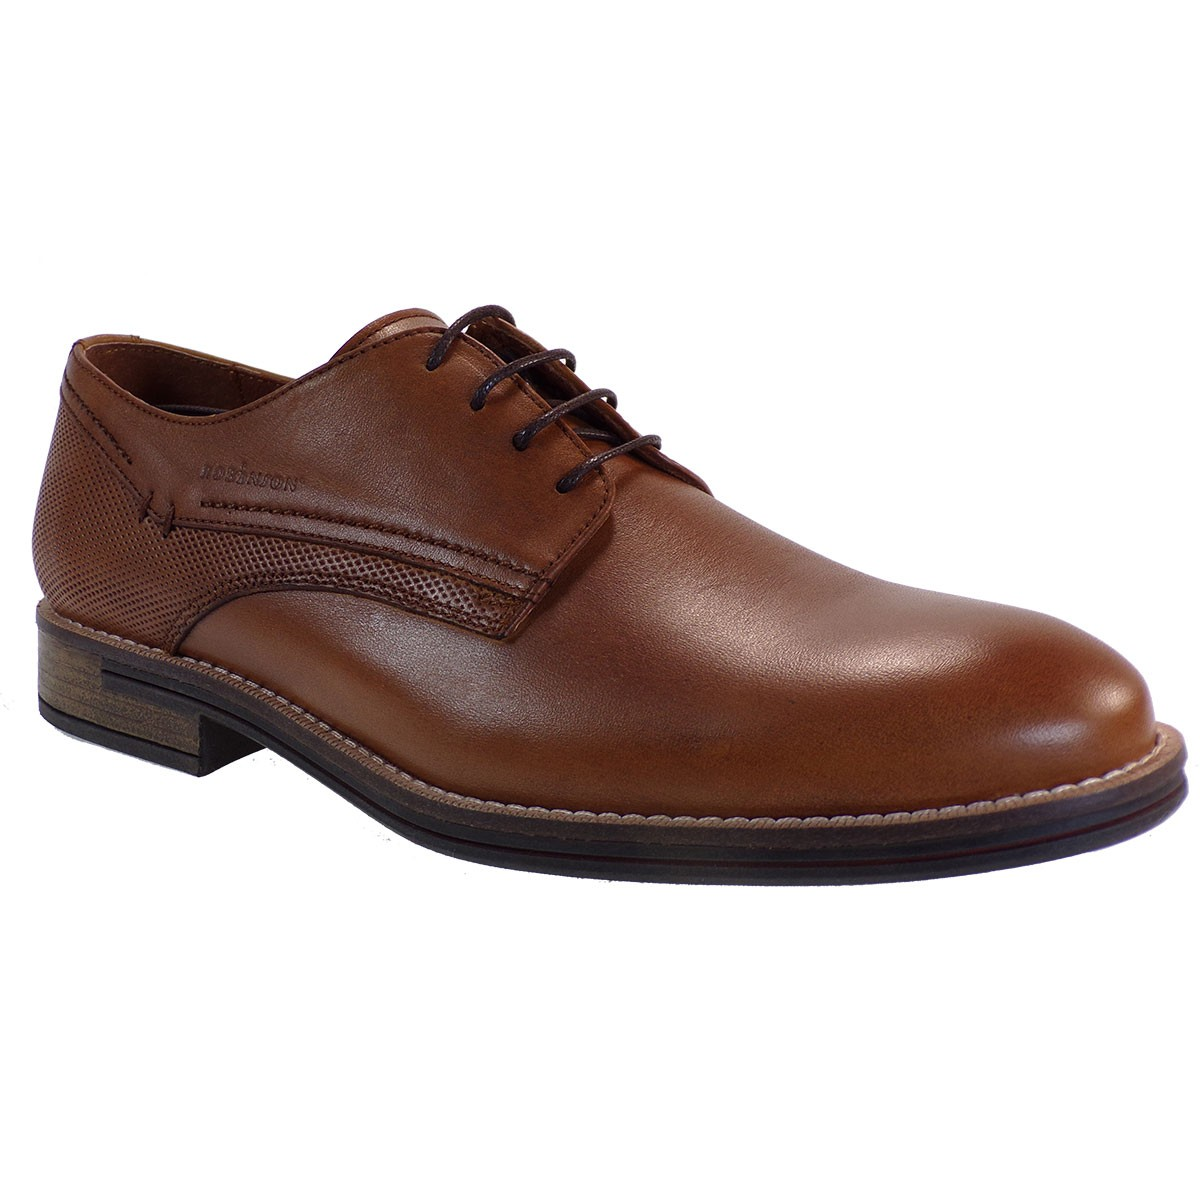 Robinson Ανδρικά Παπούτσια 2042 Ταμπά Δέρμα